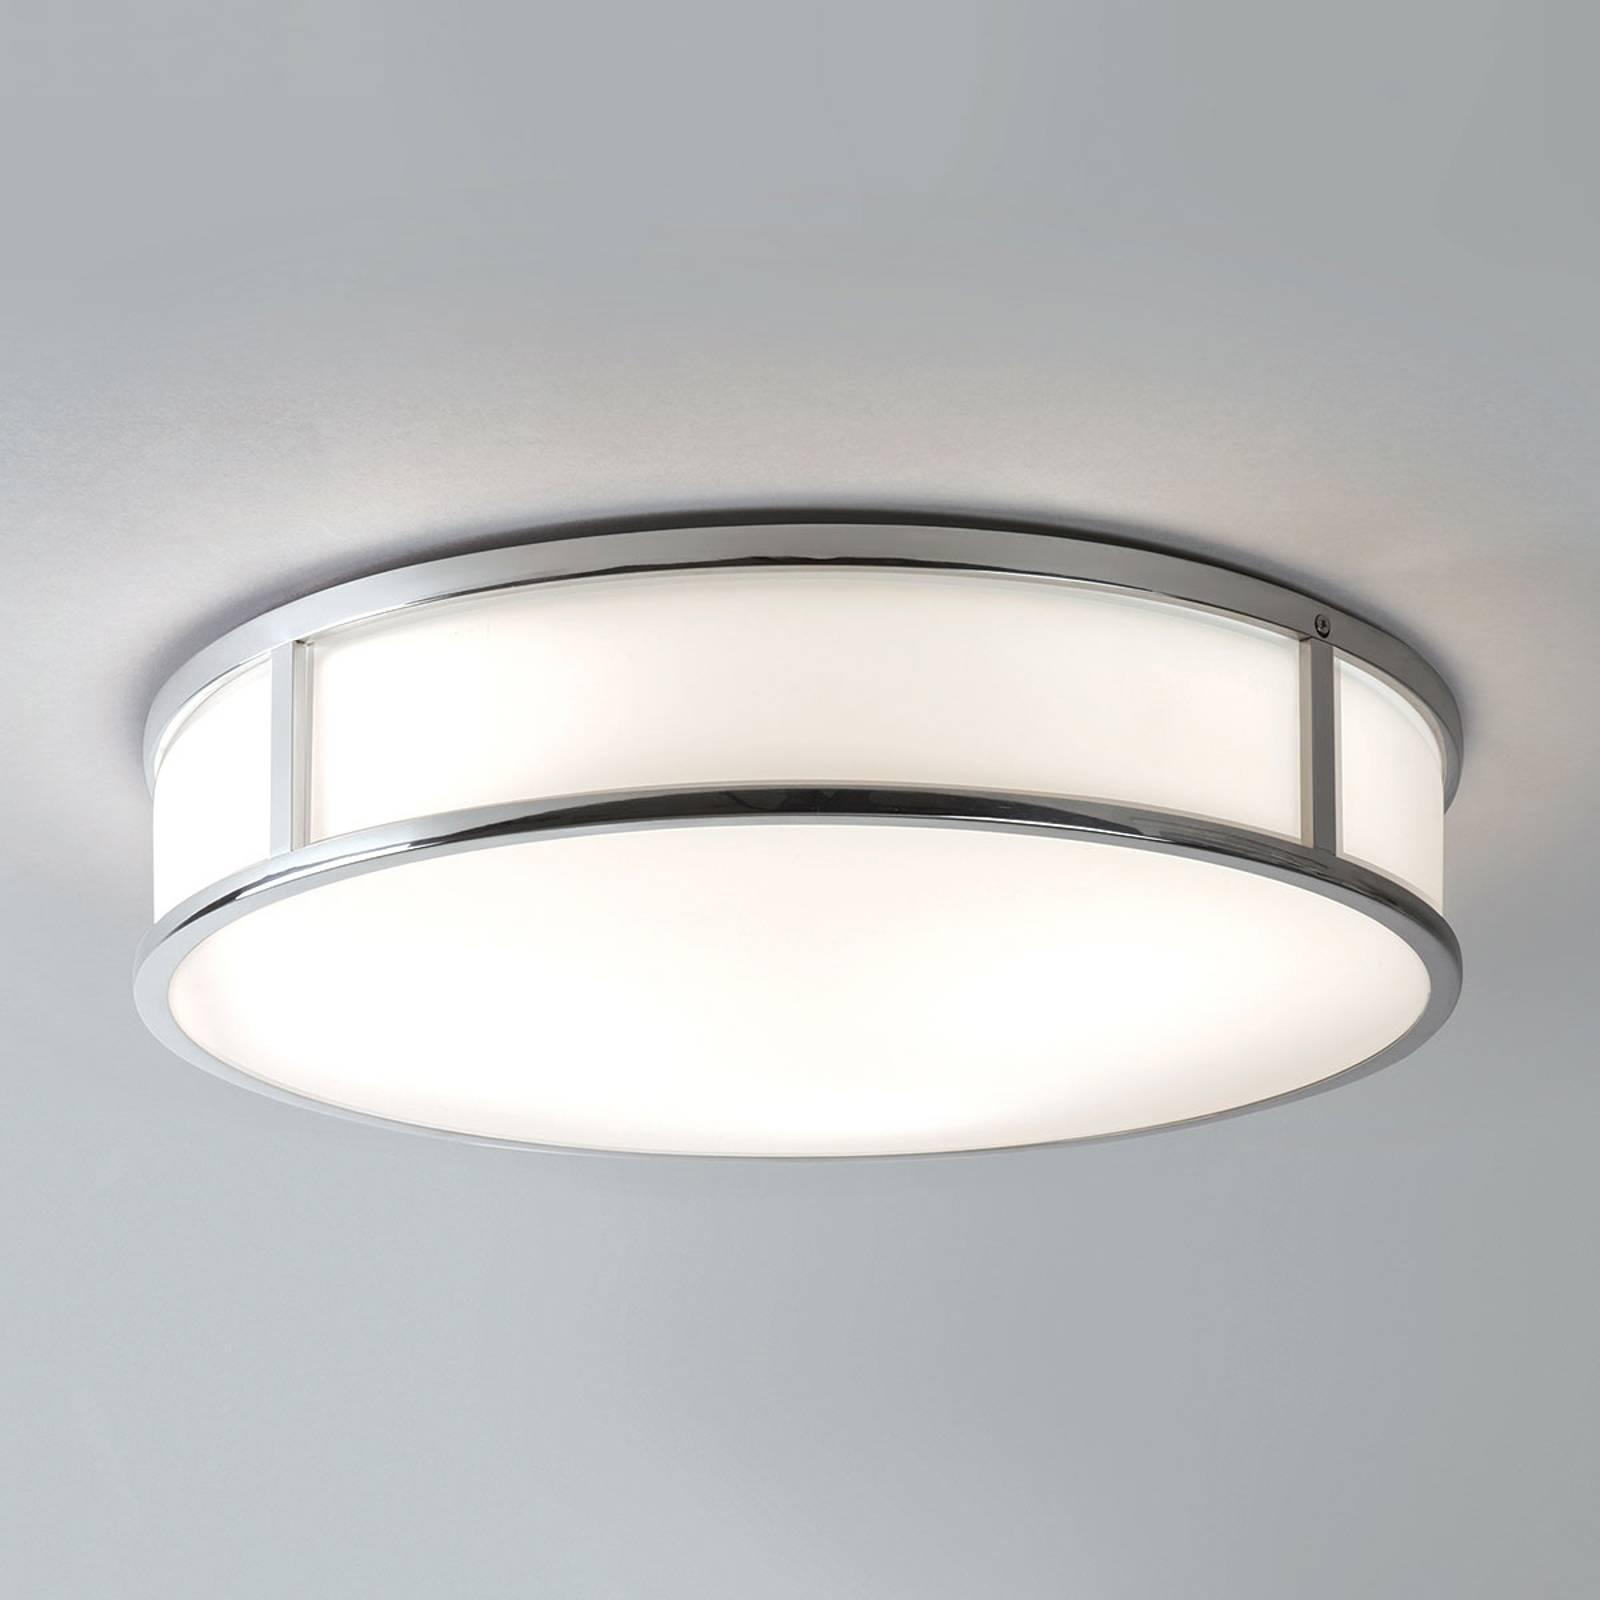 Astro Mashiko Round plafondlamp Ø 40 cm chroom